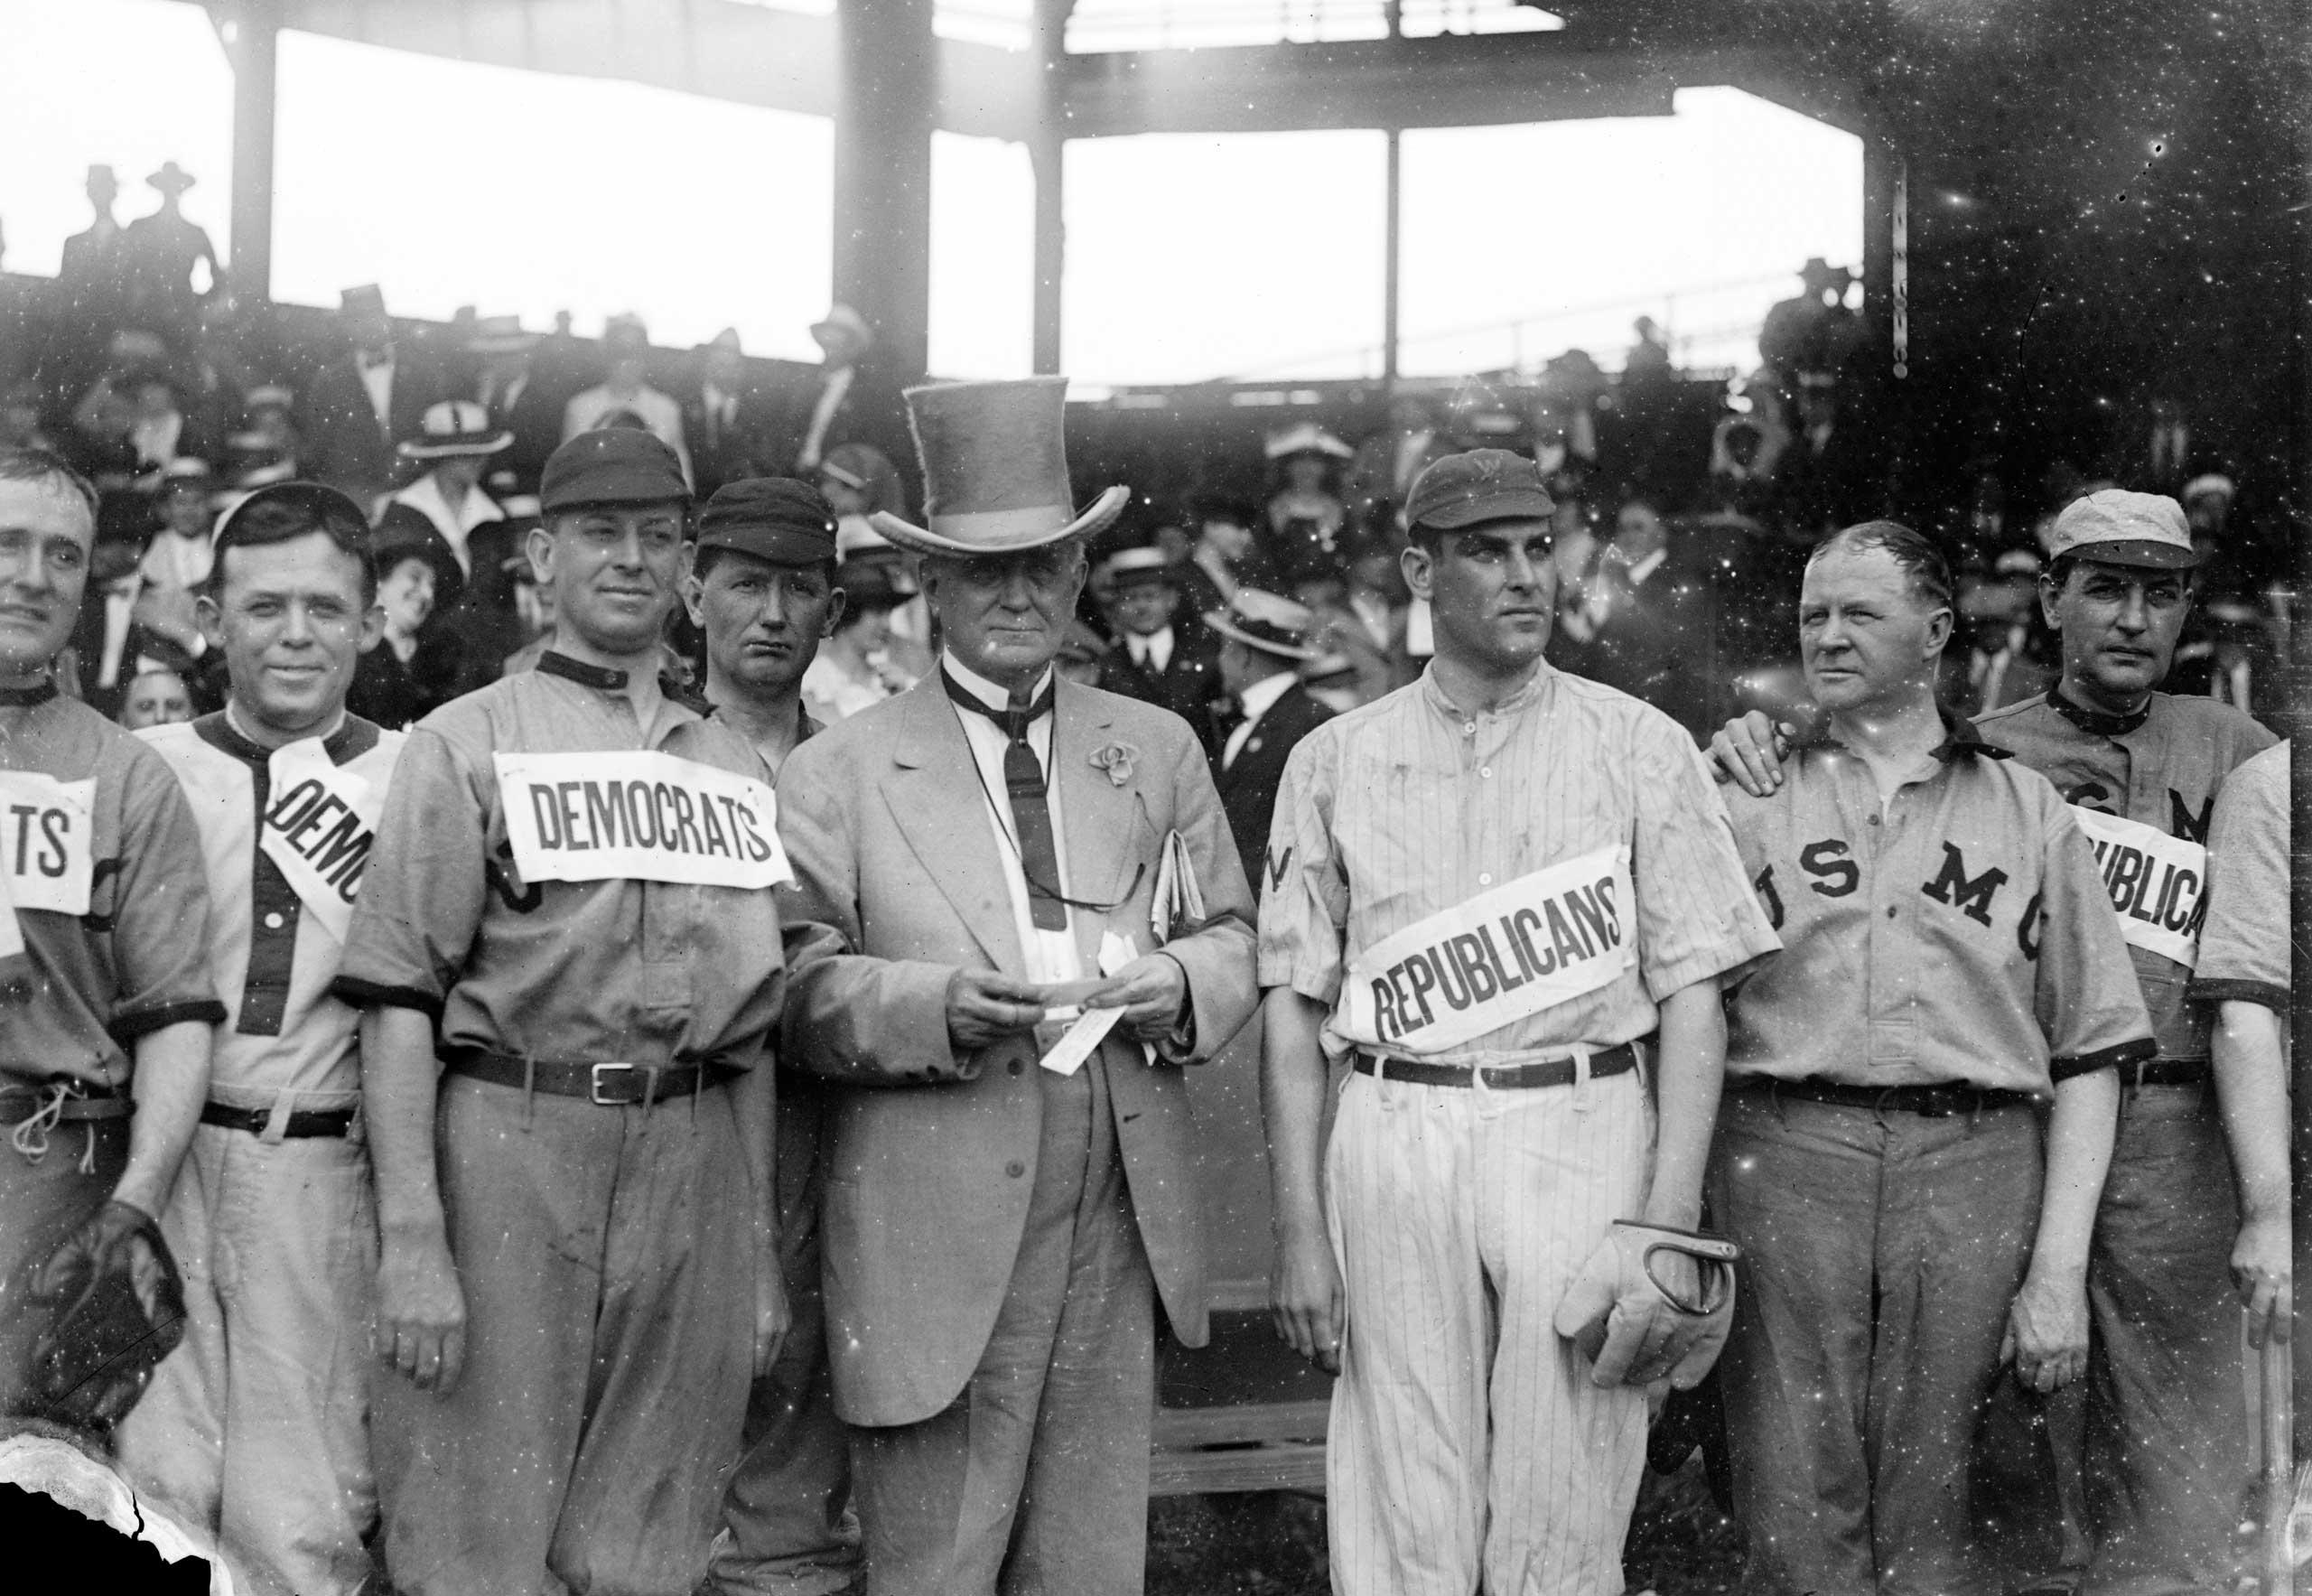 Washington Stadium hosts a baseball game between Republicans & Democrats, circa the 1900s.